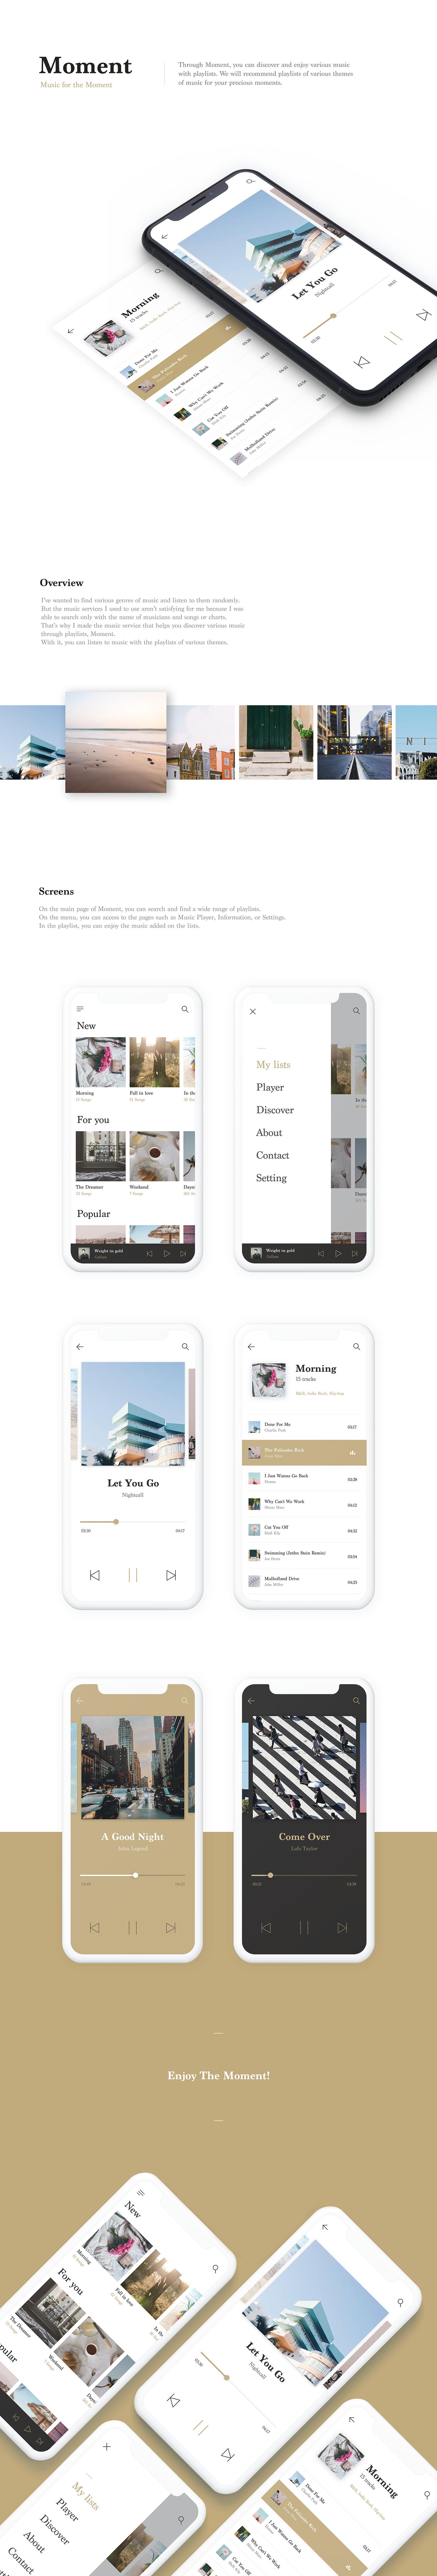 UI app music ux mobile design player ios Interface